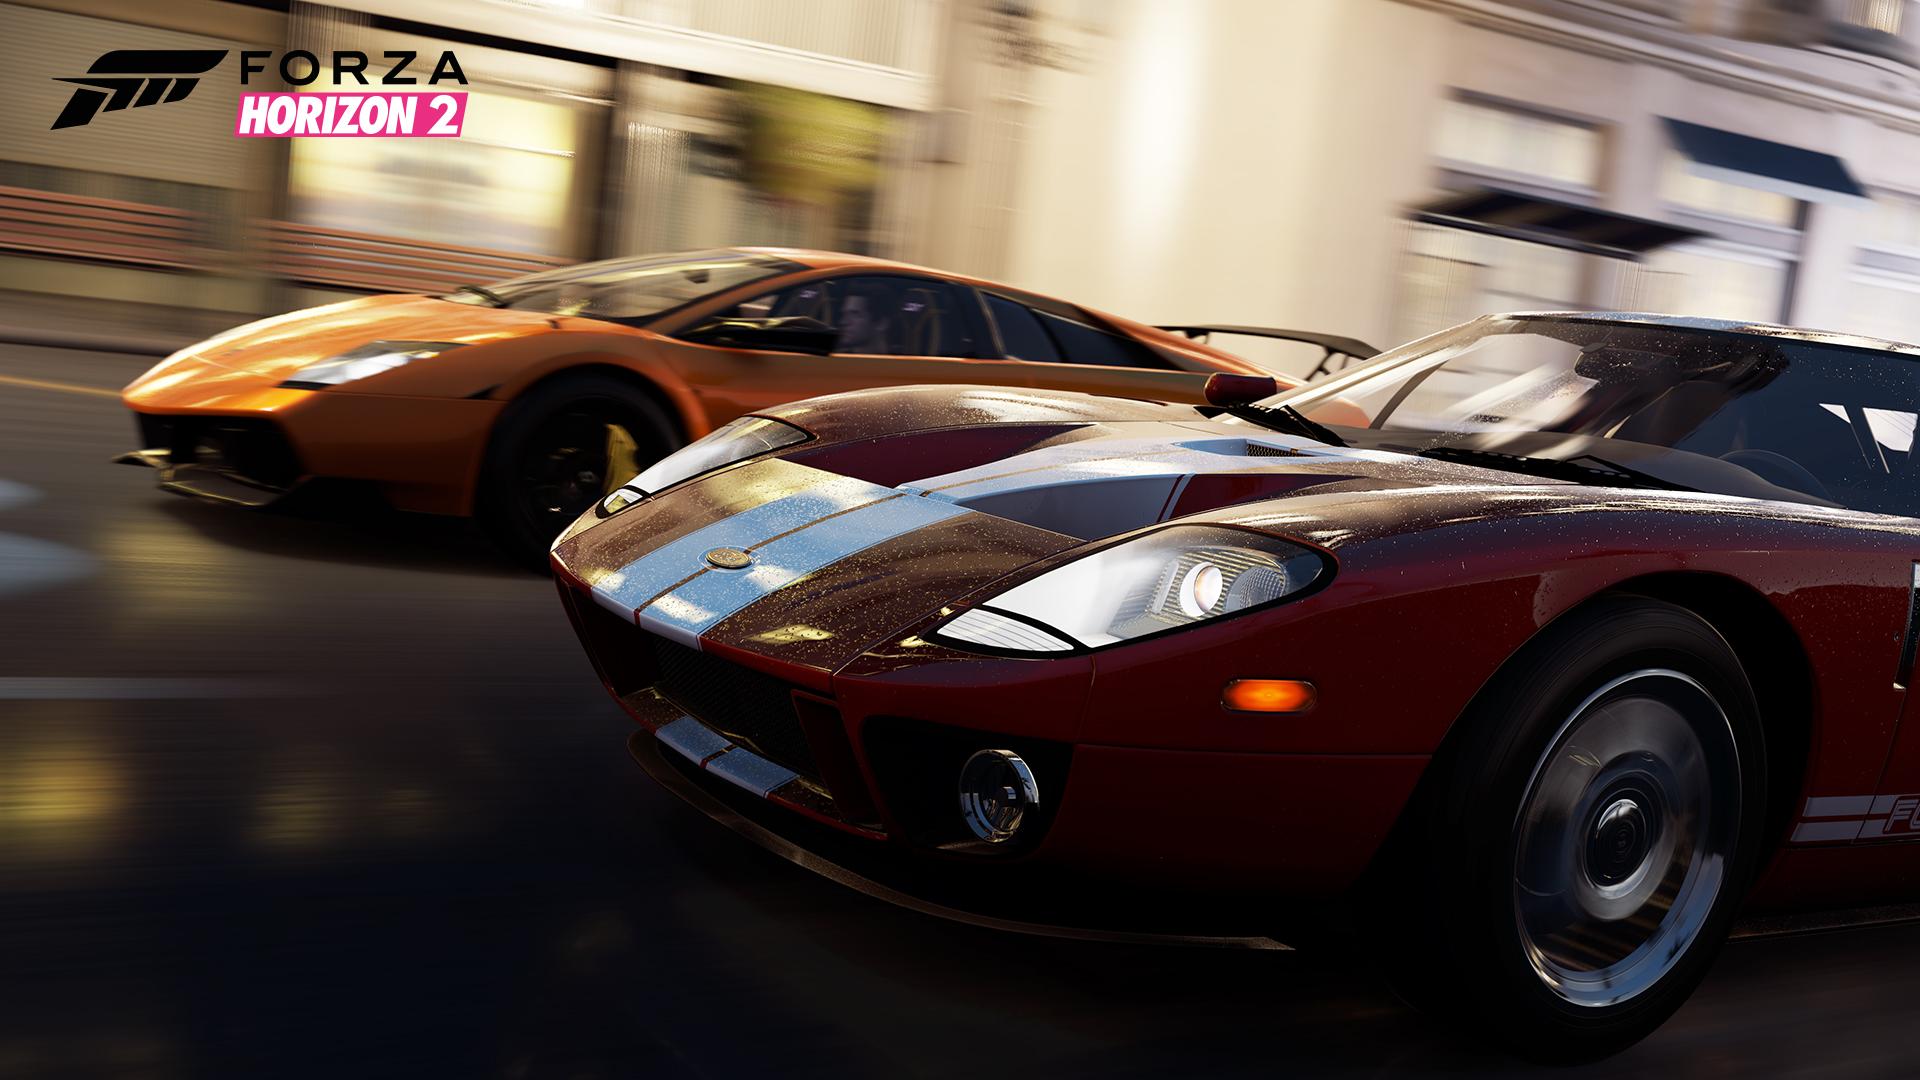 38c94870-265d-4356-9aa0-39dbc238549e.jpg?n=Reviews_04_WM_ForzaHorizon2 Elegant Lamborghini Huracan forza Horizon 2 Cars Trend